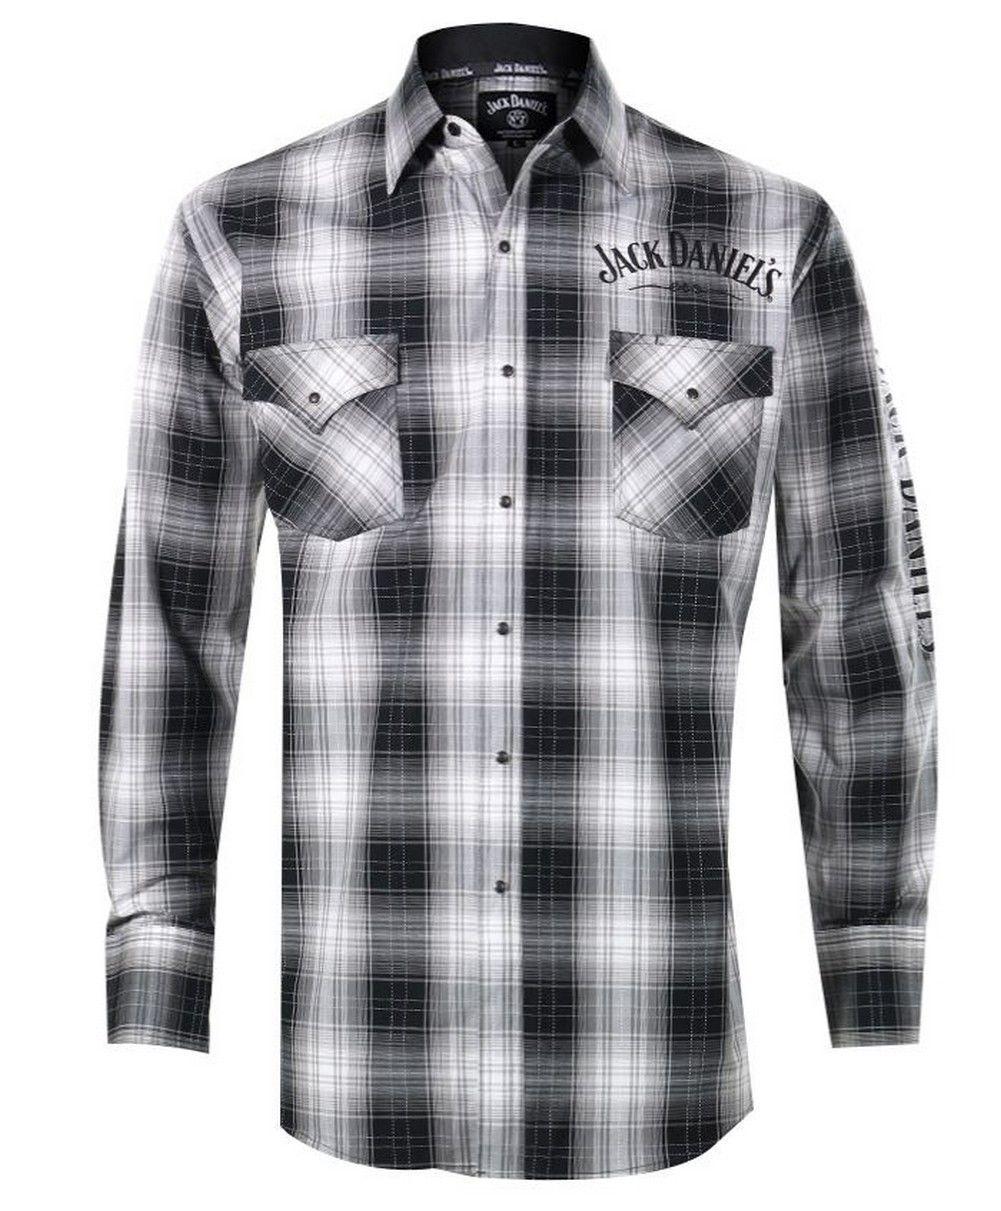 Jack Daniels camisa western camisa camiseta